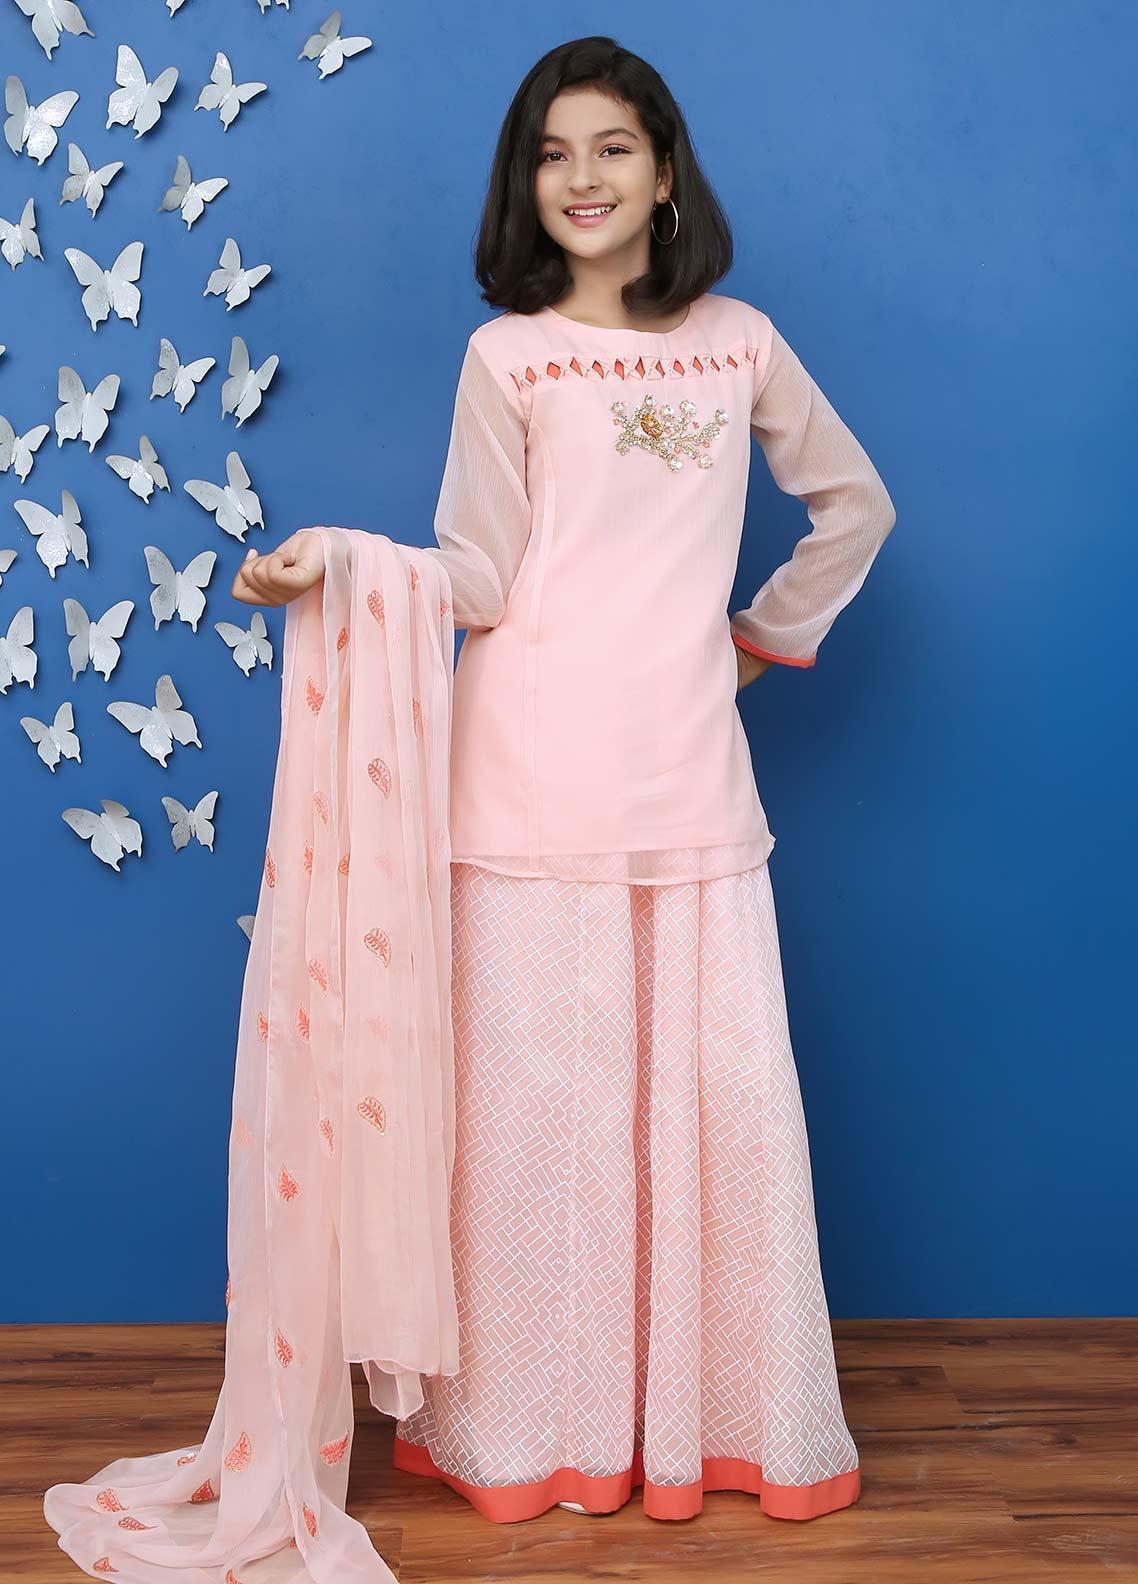 Ochre Chiffon Formal Girls 3 Piece Suit - OFW 214 Pink